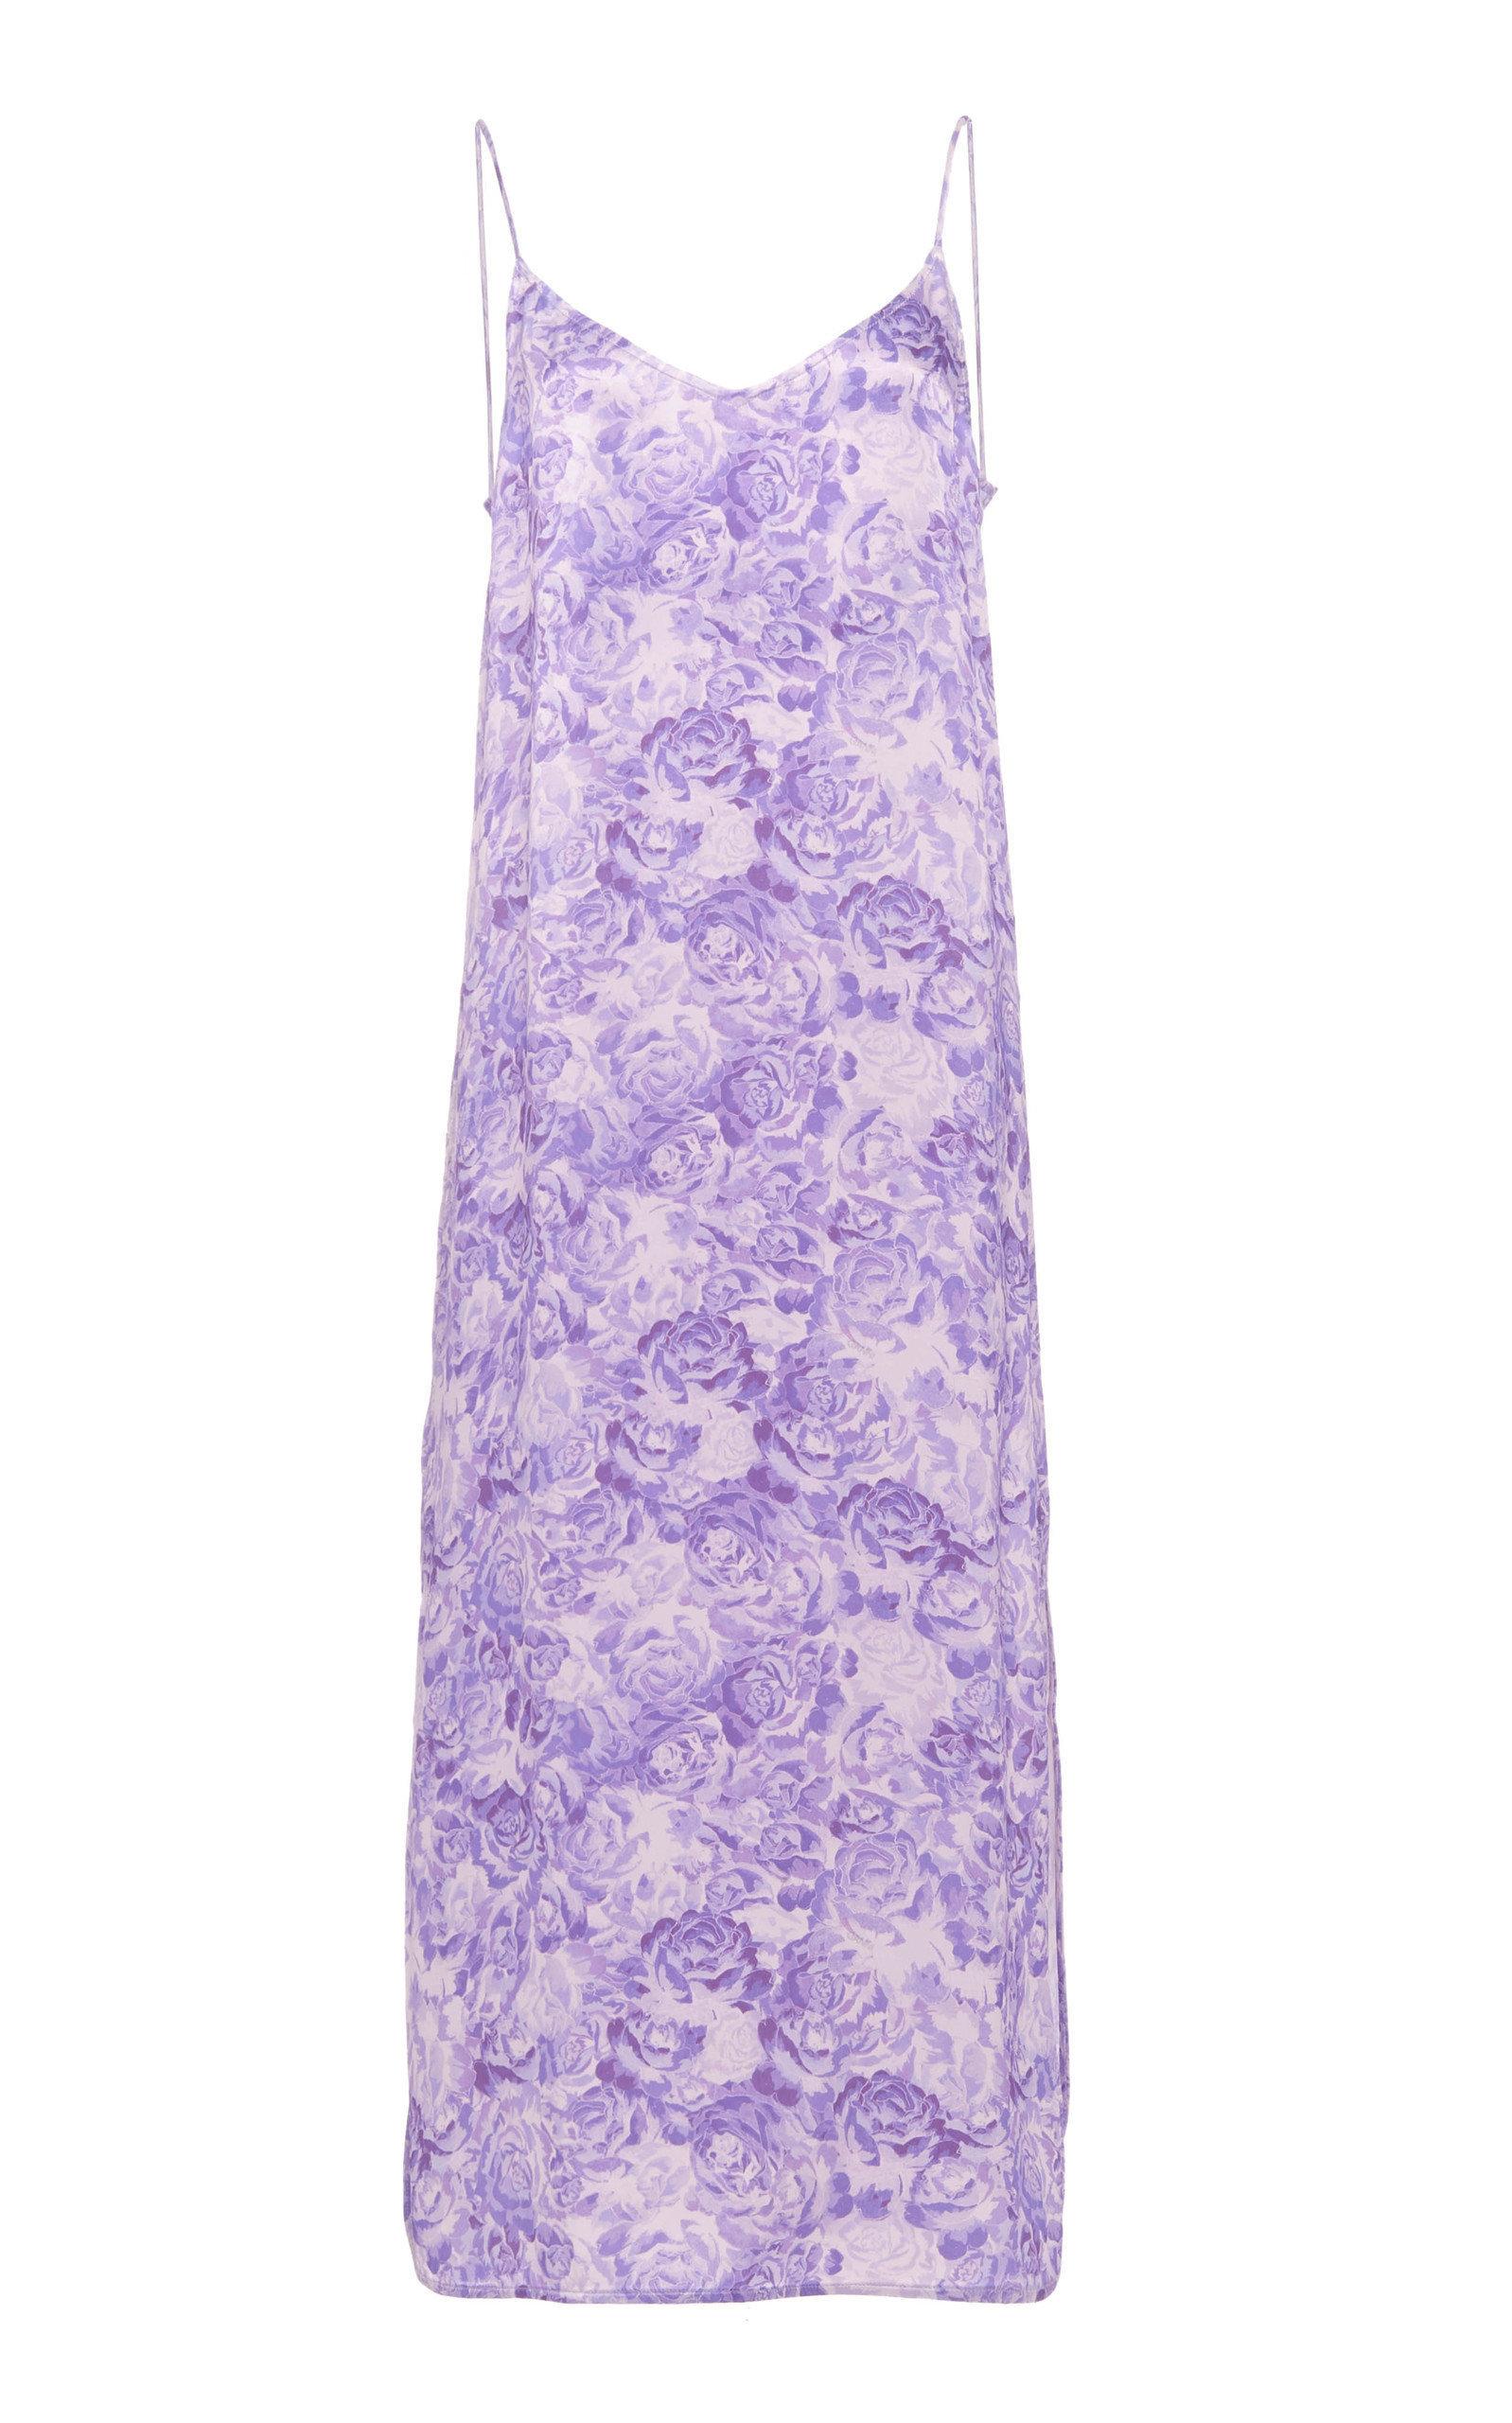 Heavy Satin Floral Slip Dress